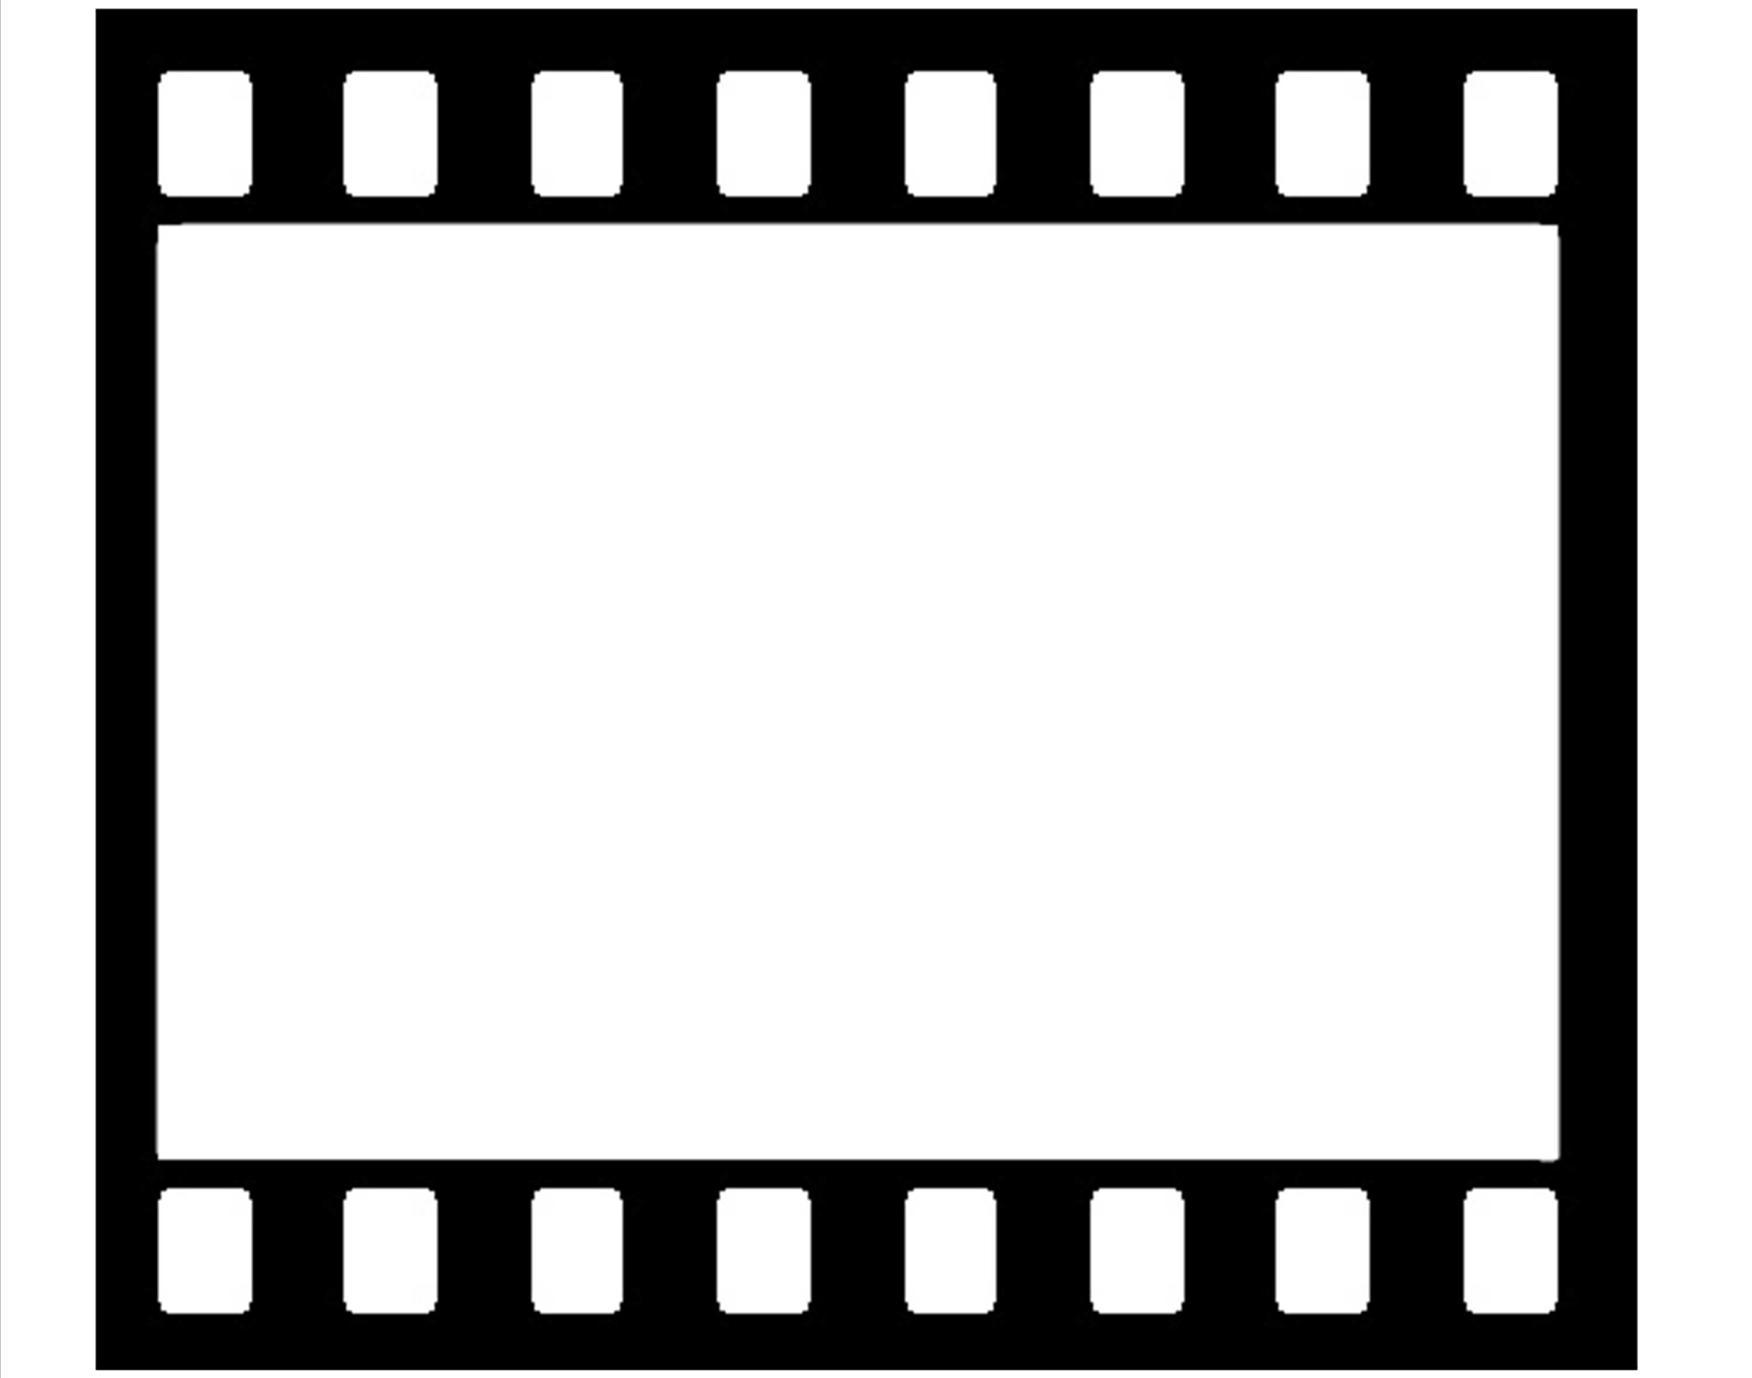 1752x1378 Film Reel Border Clipart